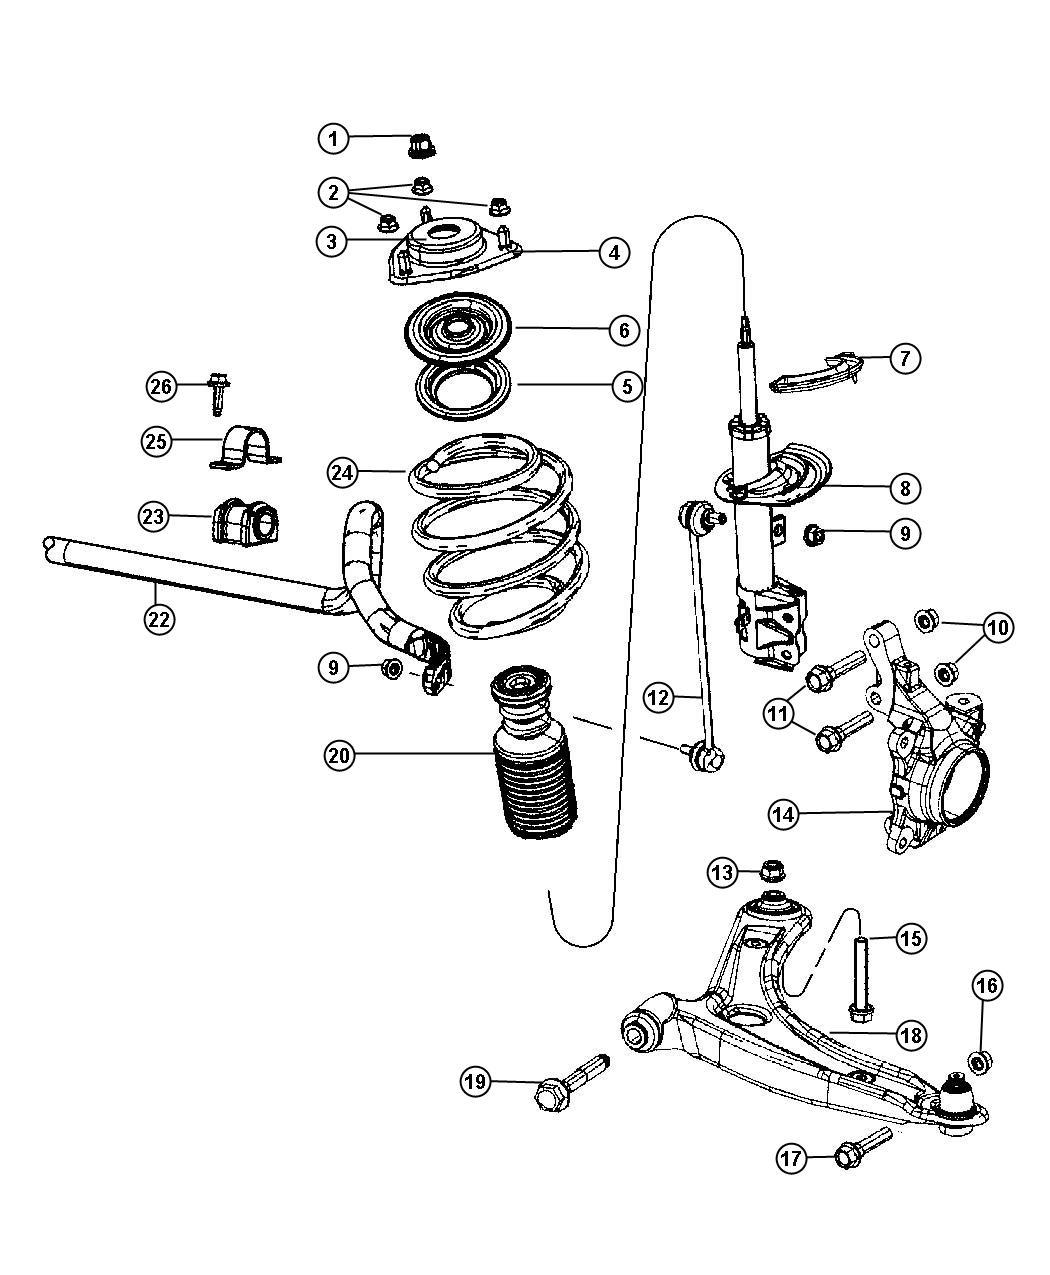 Dodge Caliber Retainer. Stabilizer bar grommet, sway bar